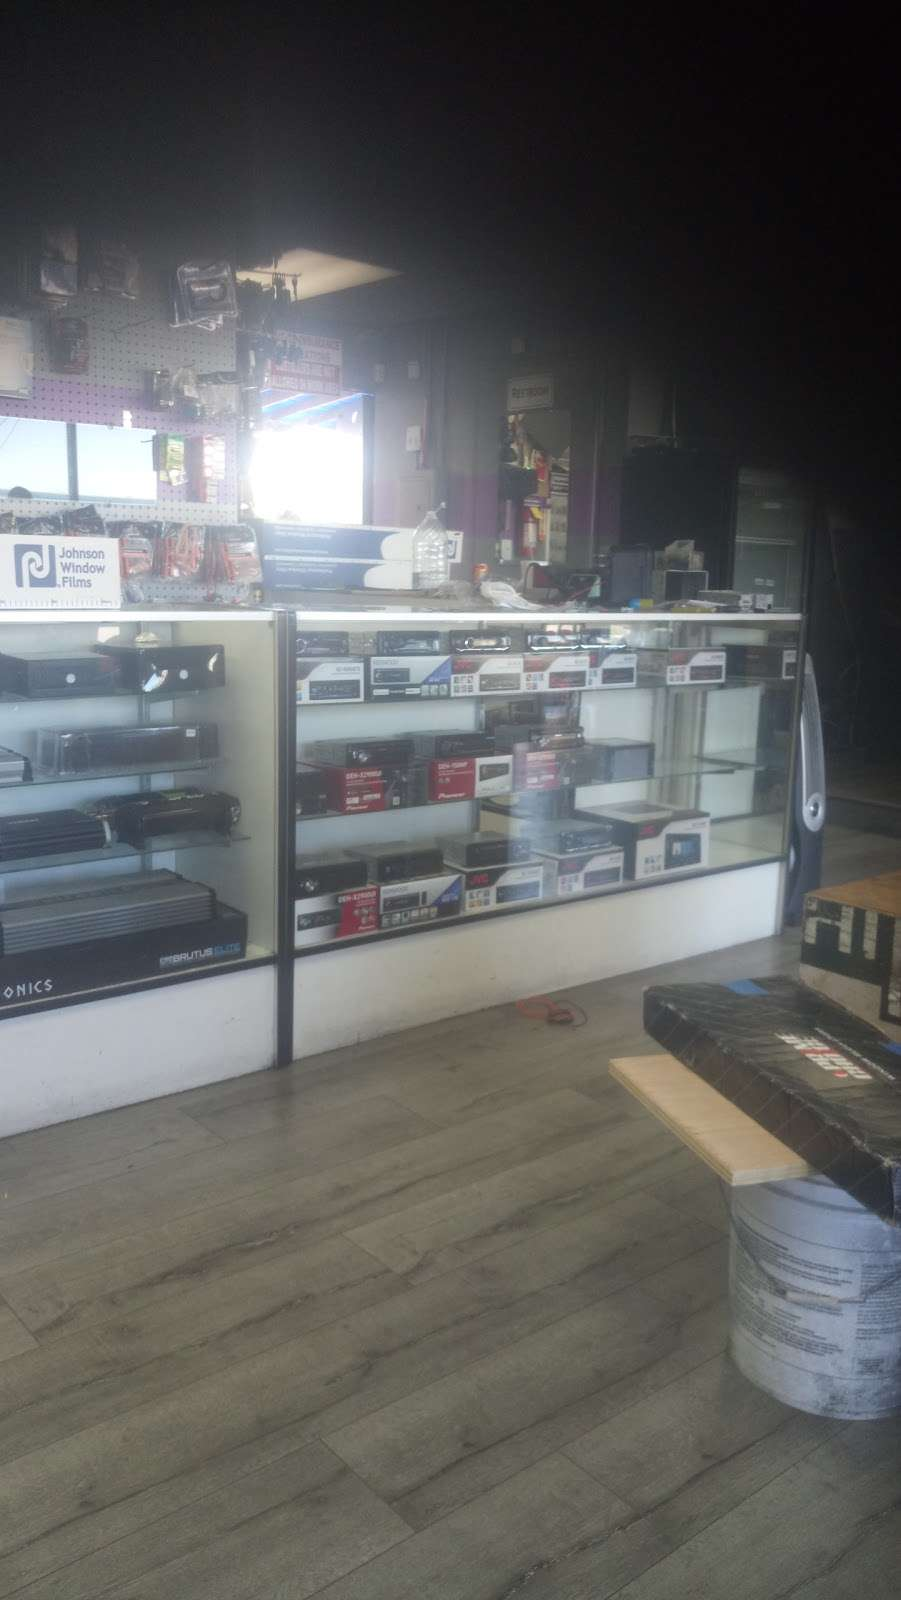 Kreative Audio & Tint - car repair  | Photo 2 of 4 | Address: 4715 Peck Rd, El Monte, CA 91732, USA | Phone: (626) 443-3989